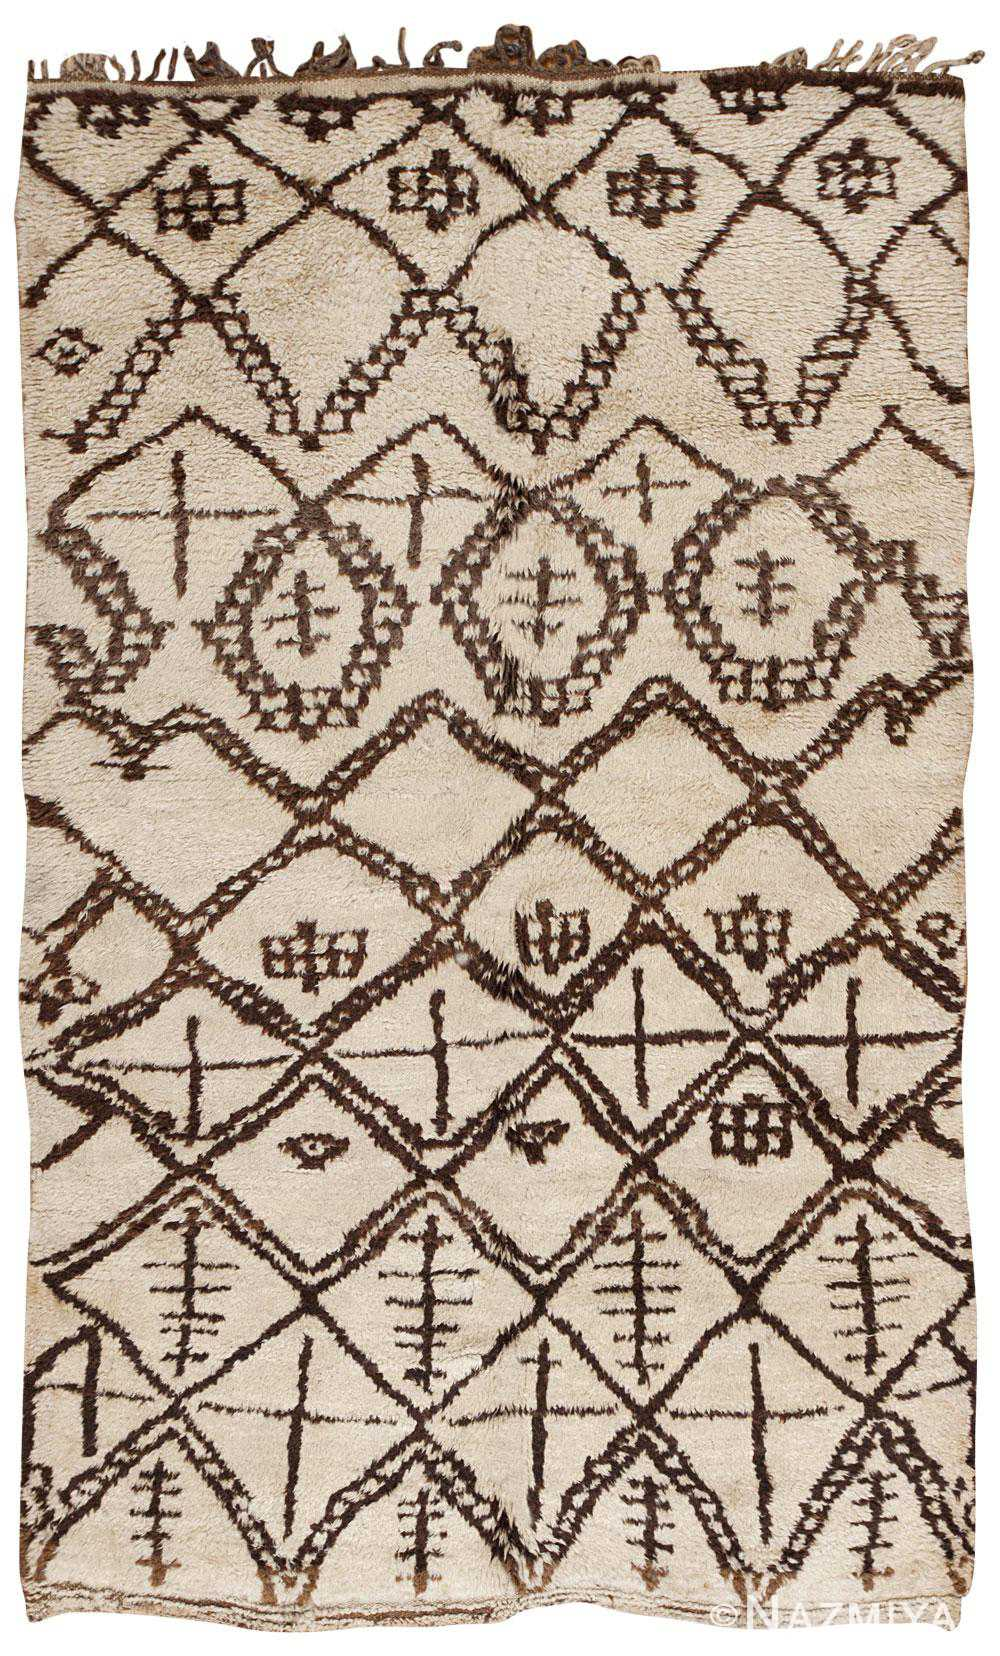 Vintage Moroccan Rug 45601 Detail/Large View